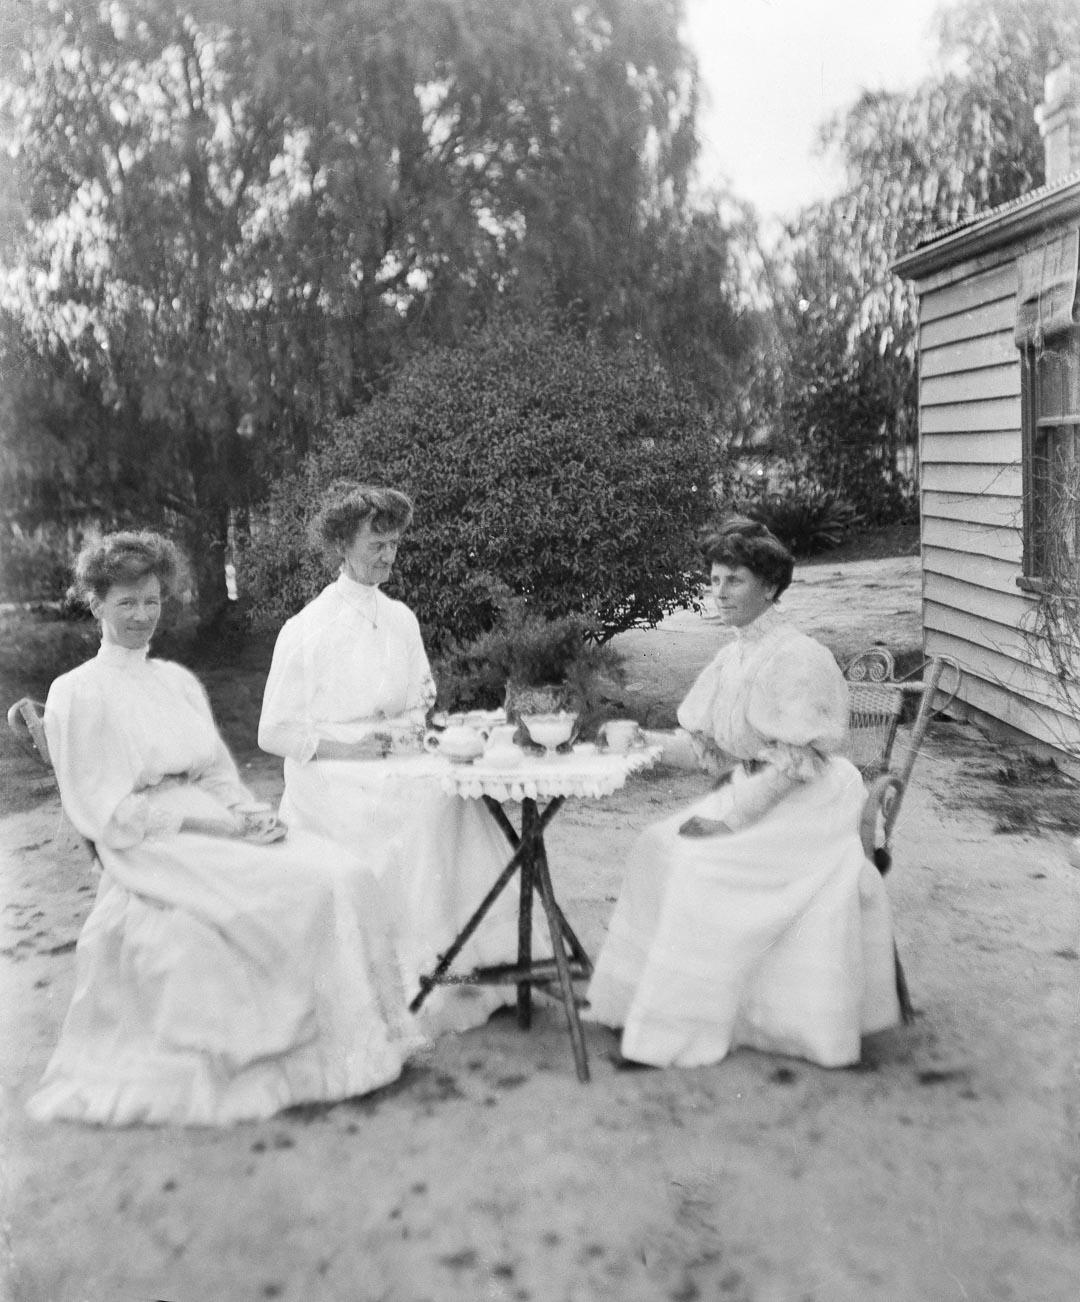 Left to right: Florence 'Floss' Agnes Reid (1875-1966), Susanna 'Susie' Lucy Reid (1865-1954) and Adela Barton Reid (1863-1958)